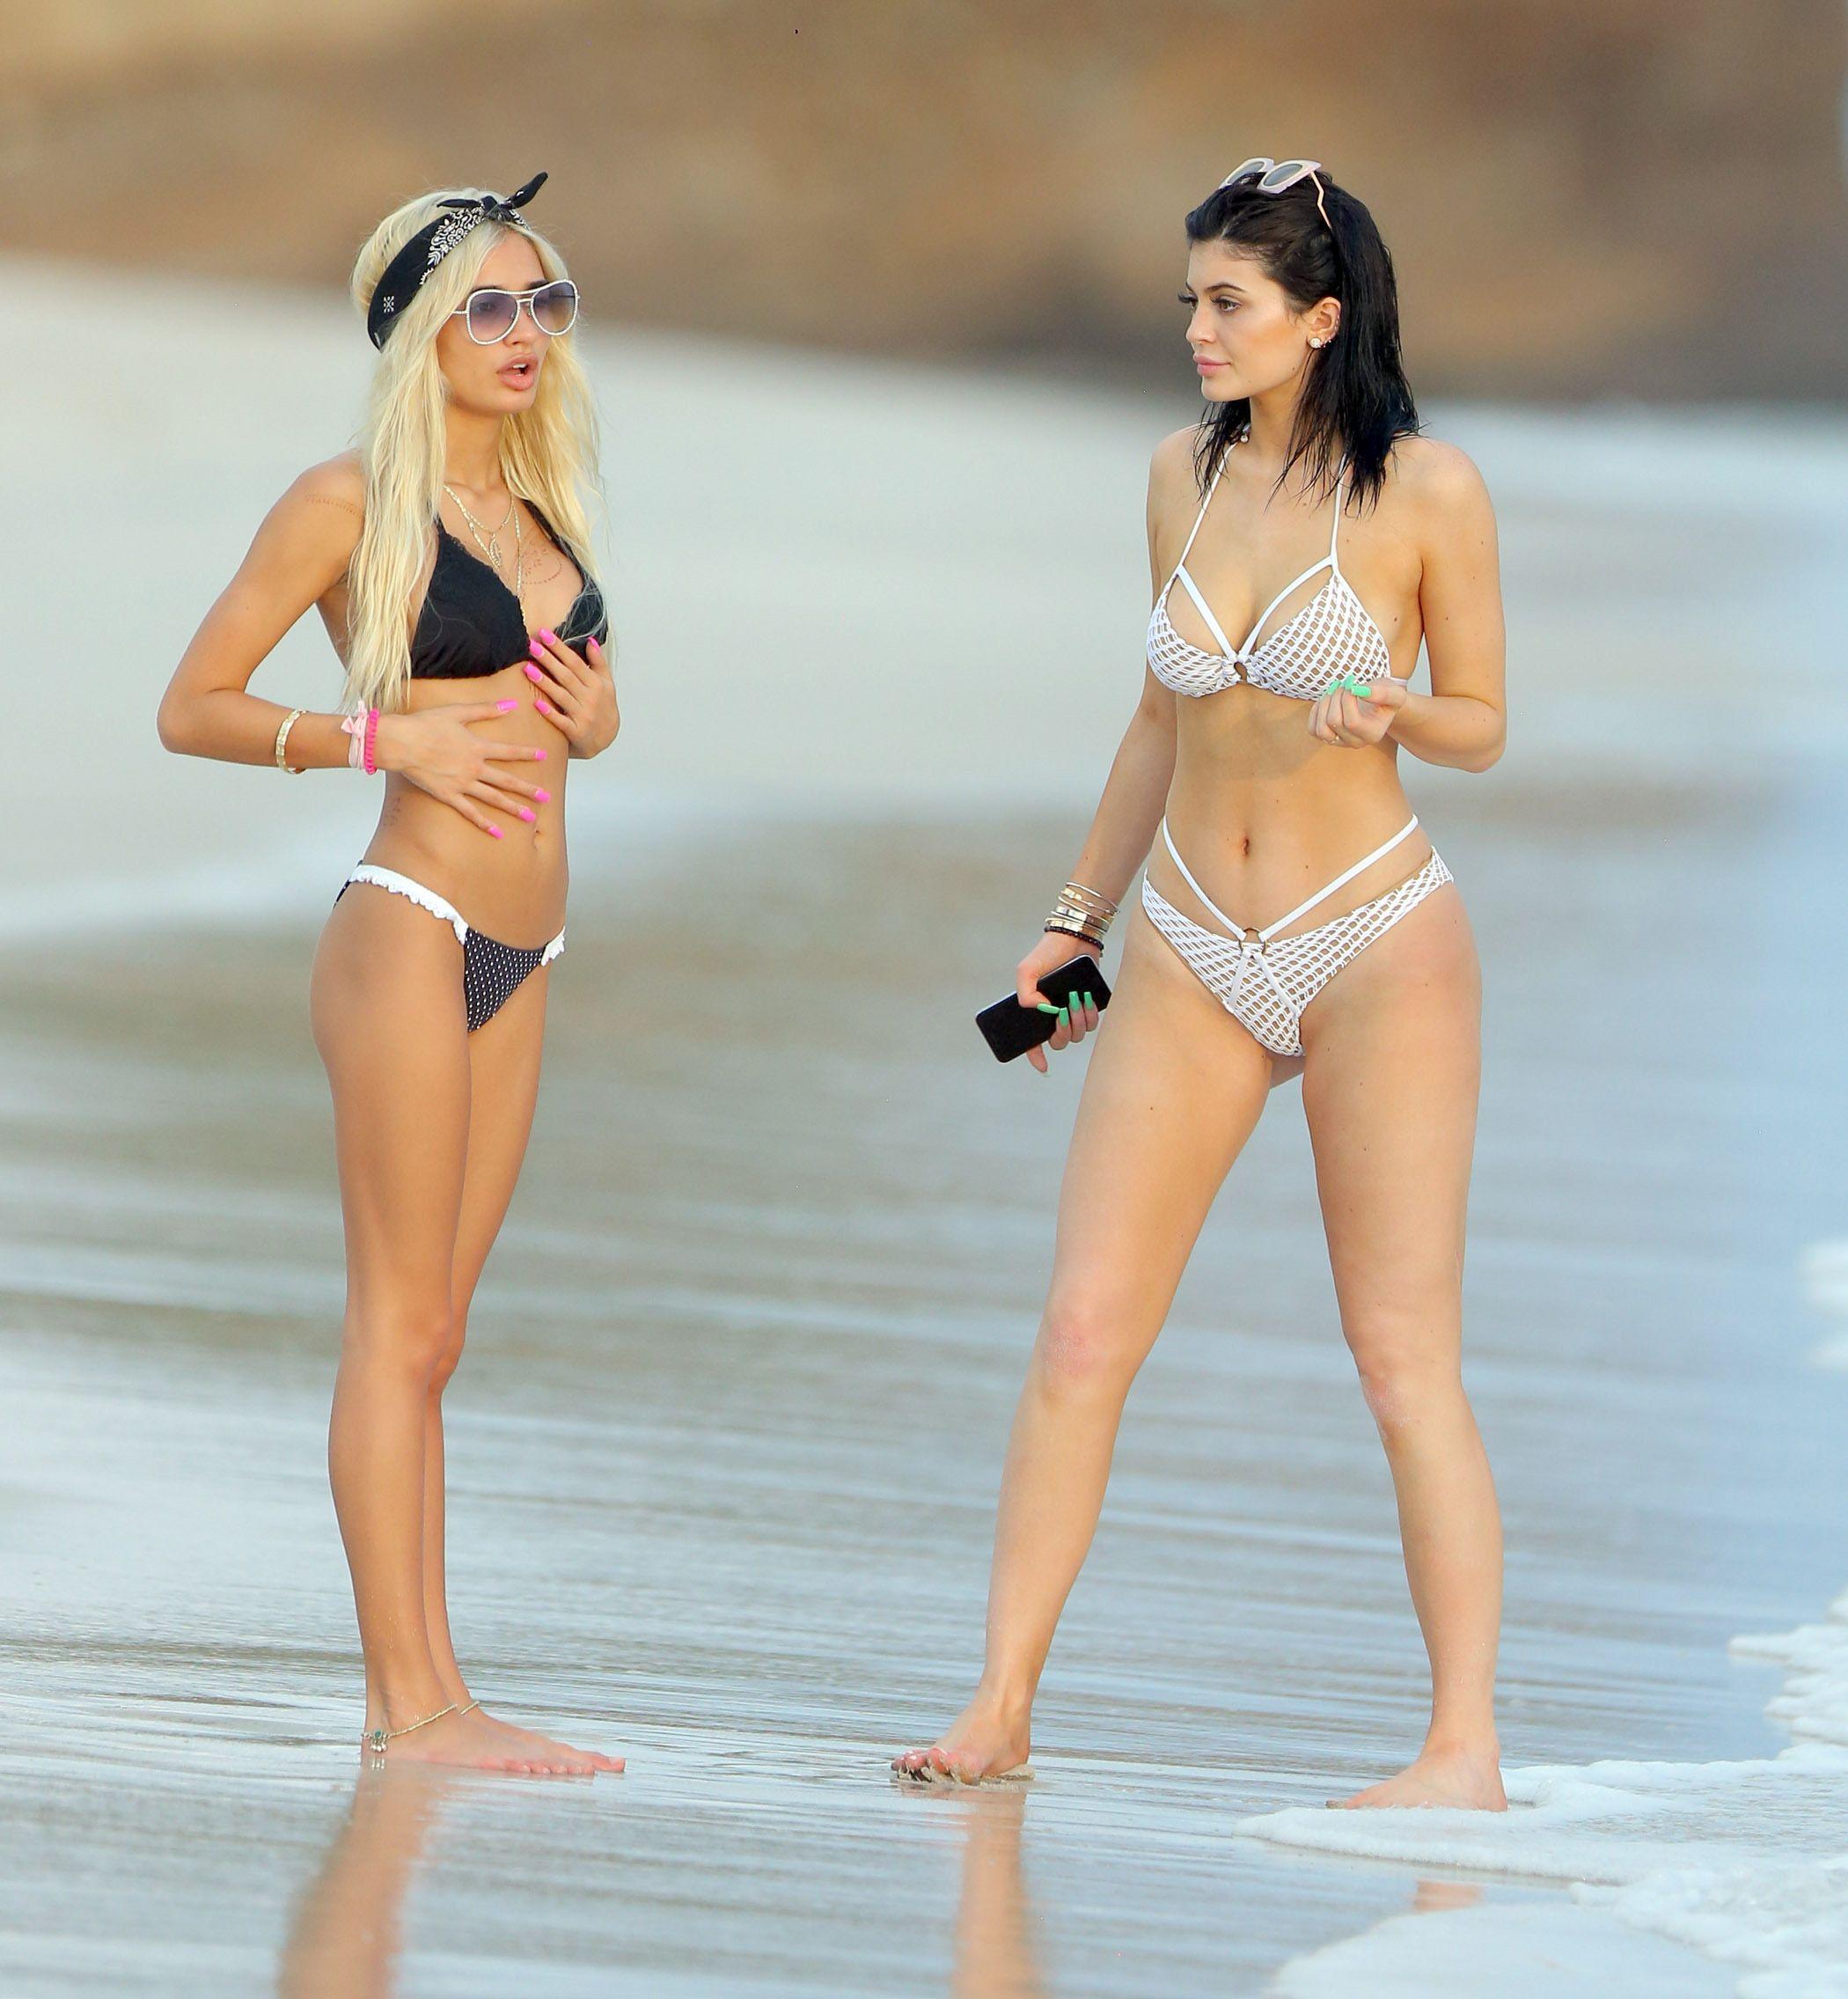 Kylie Jenner in a Bikini (27 Photos)